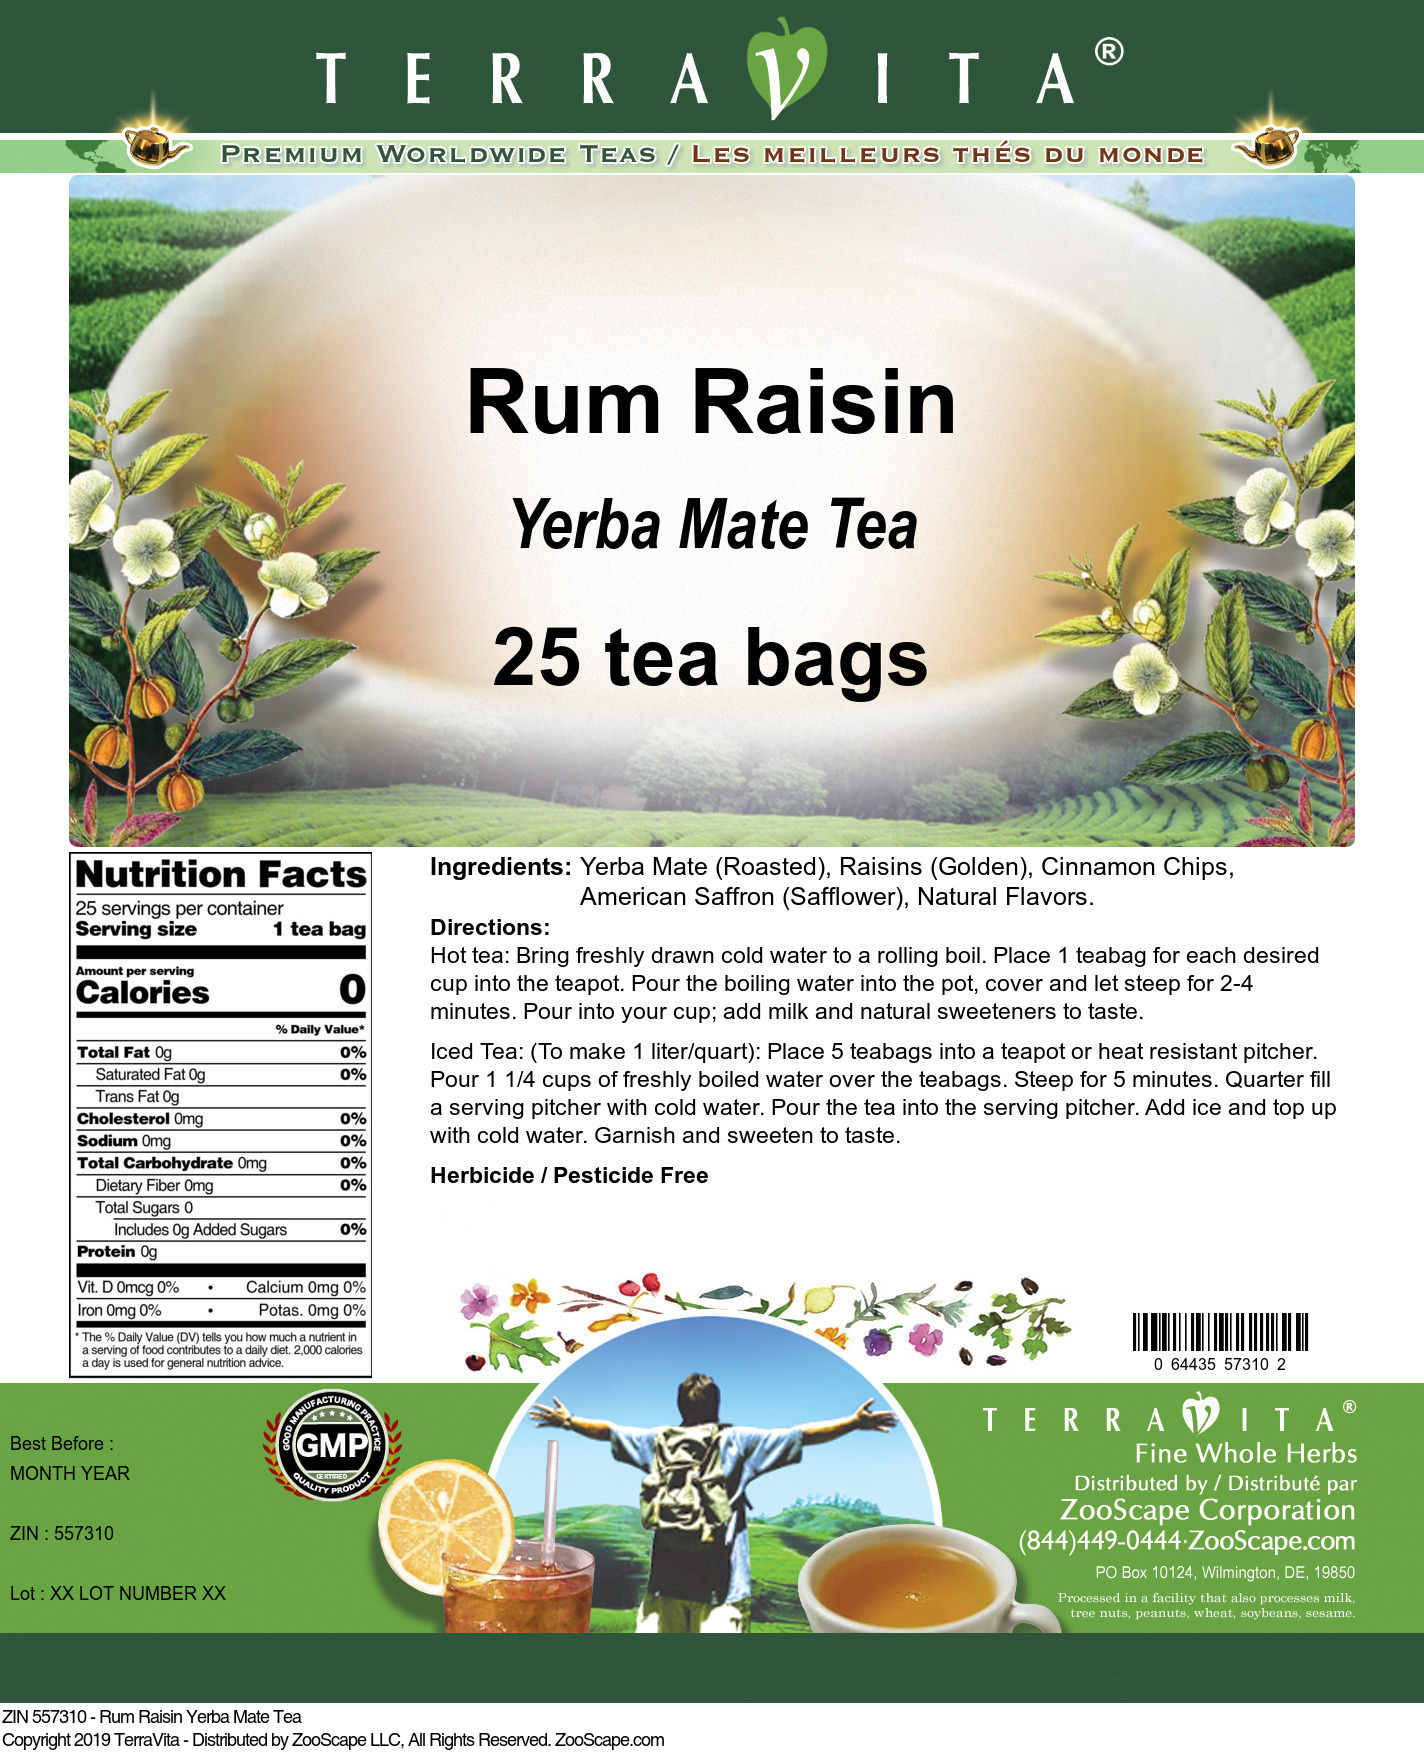 Rum Raisin Yerba Mate Tea